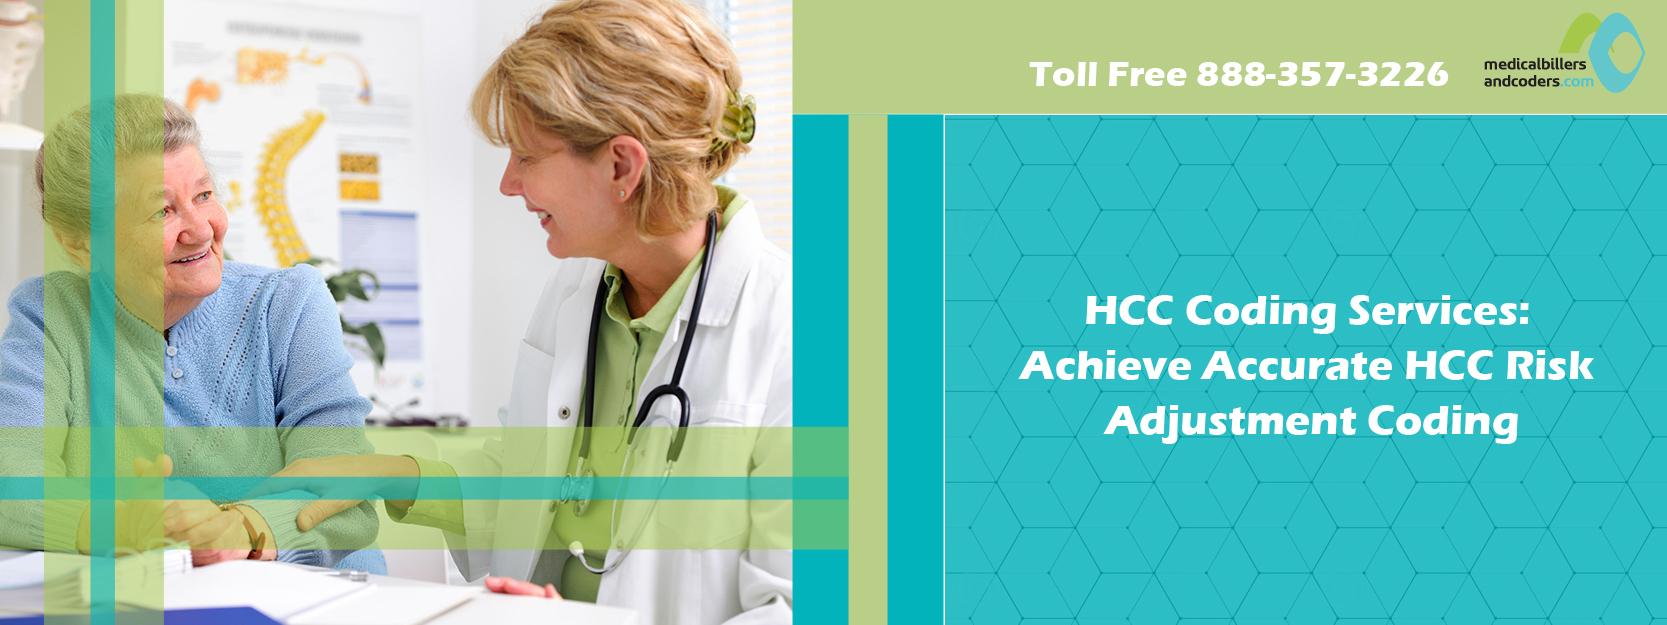 blog-hcc-coding-services-achieve-accurate-hcc-risk-adjustment-coding